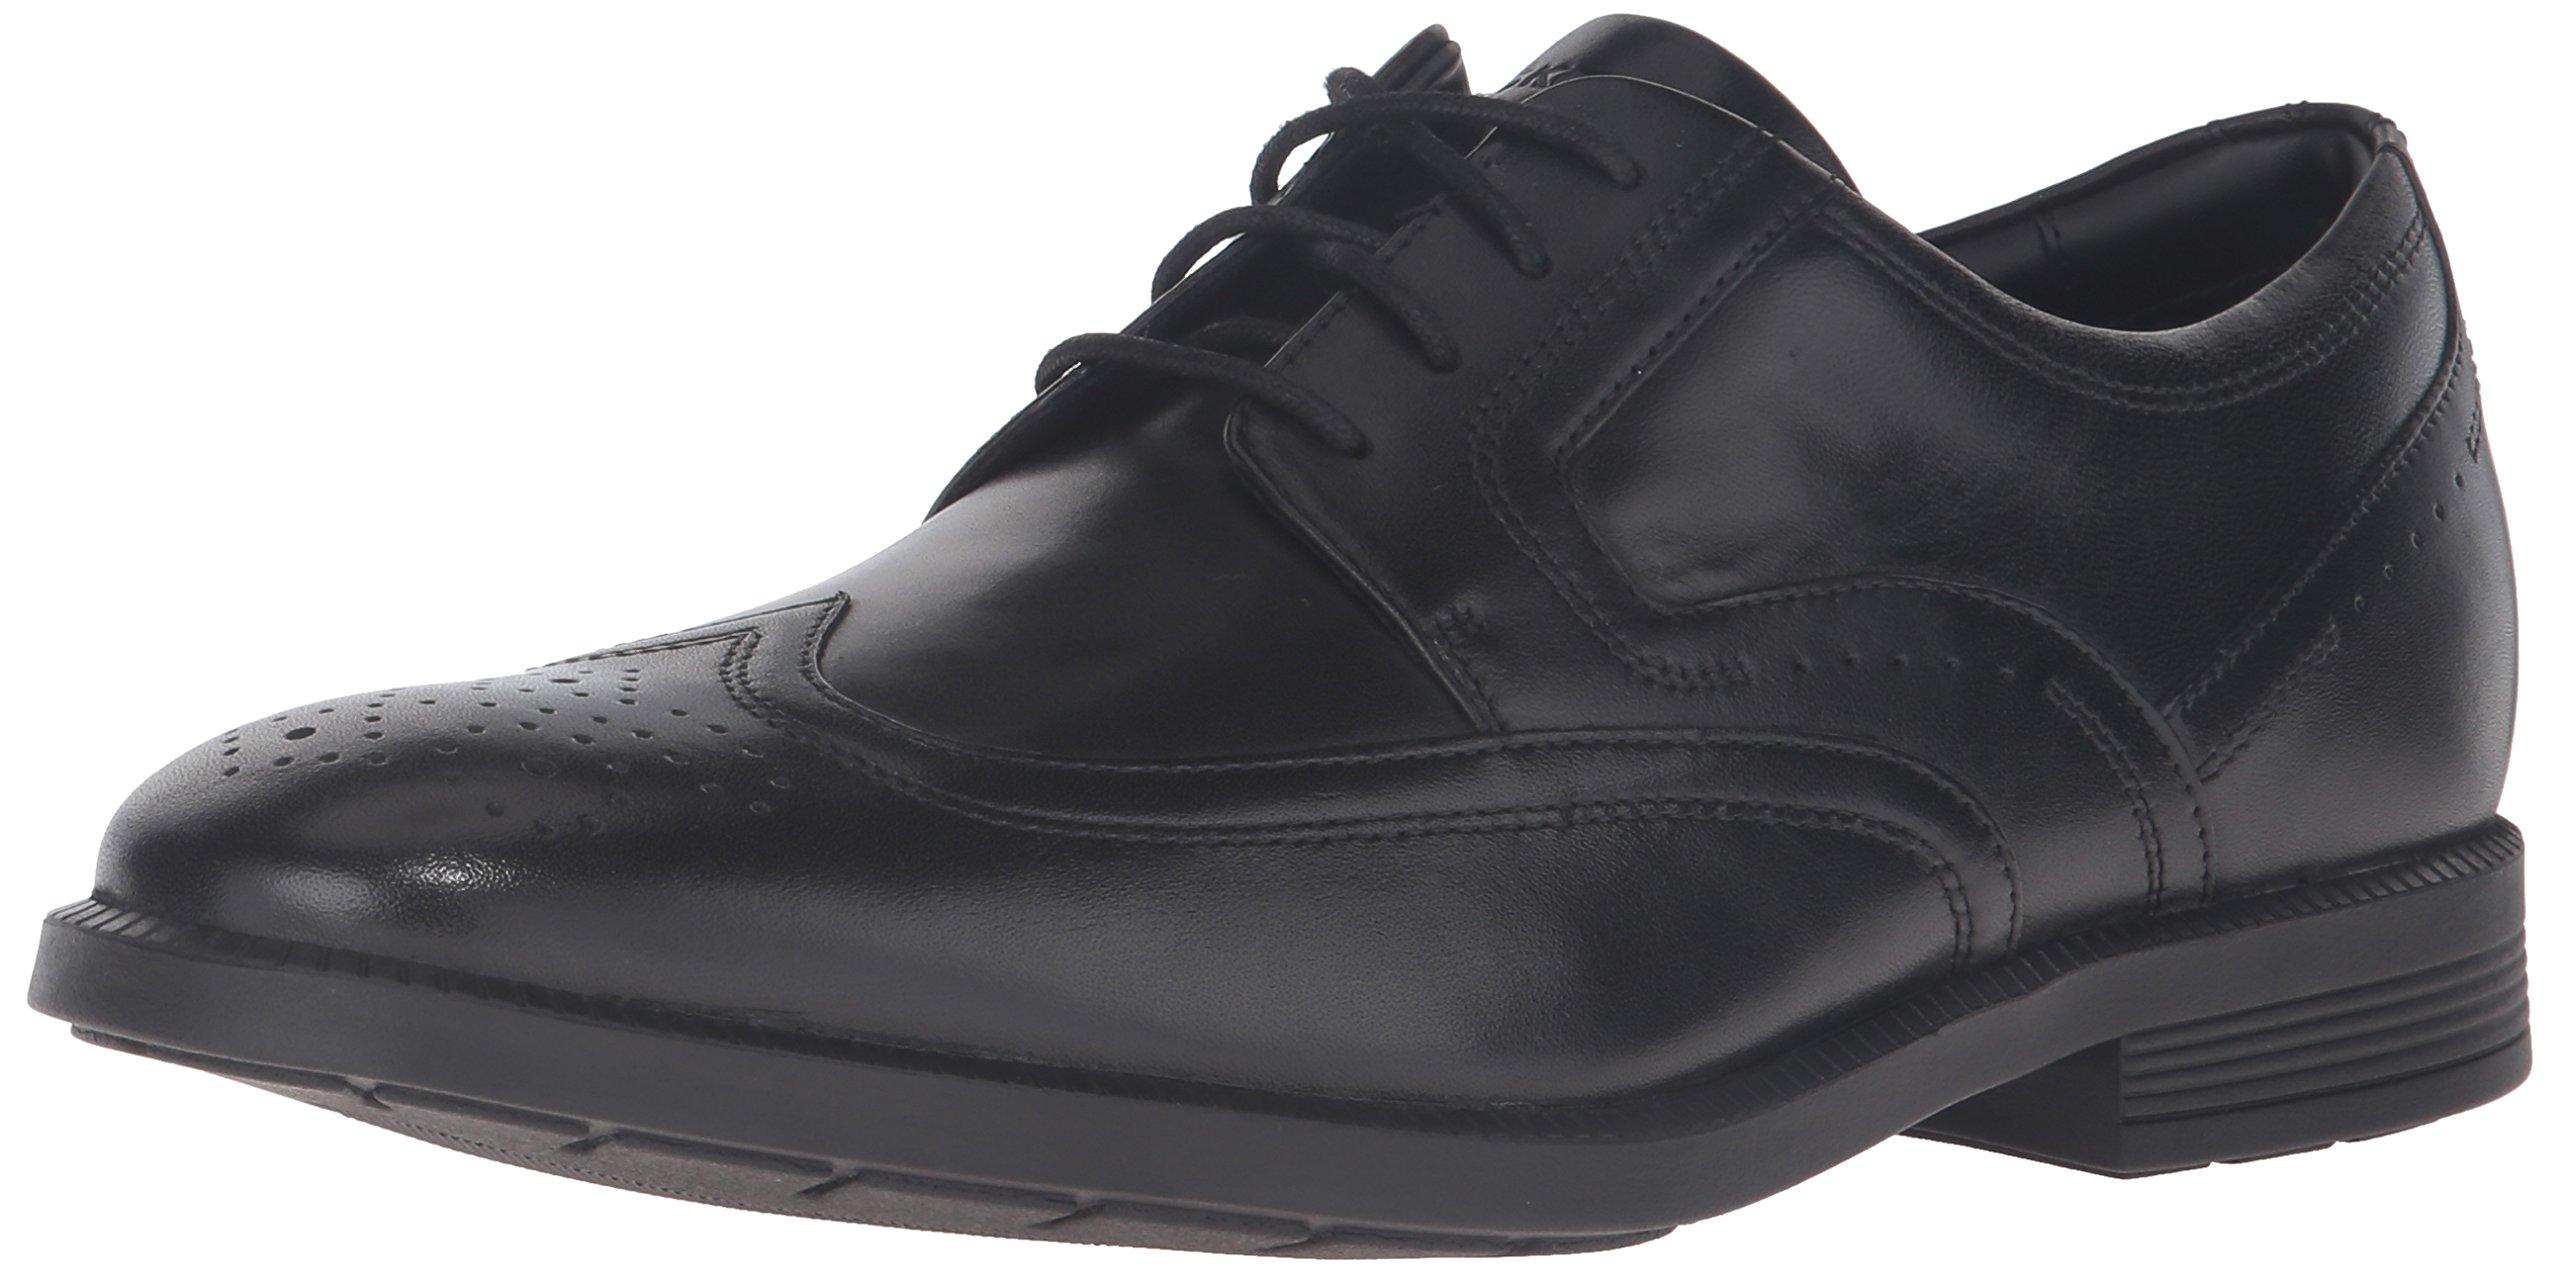 Rockport Men's Dressports Business Wing Tip Oxford, Black, 10.5 Medium US by Rockport